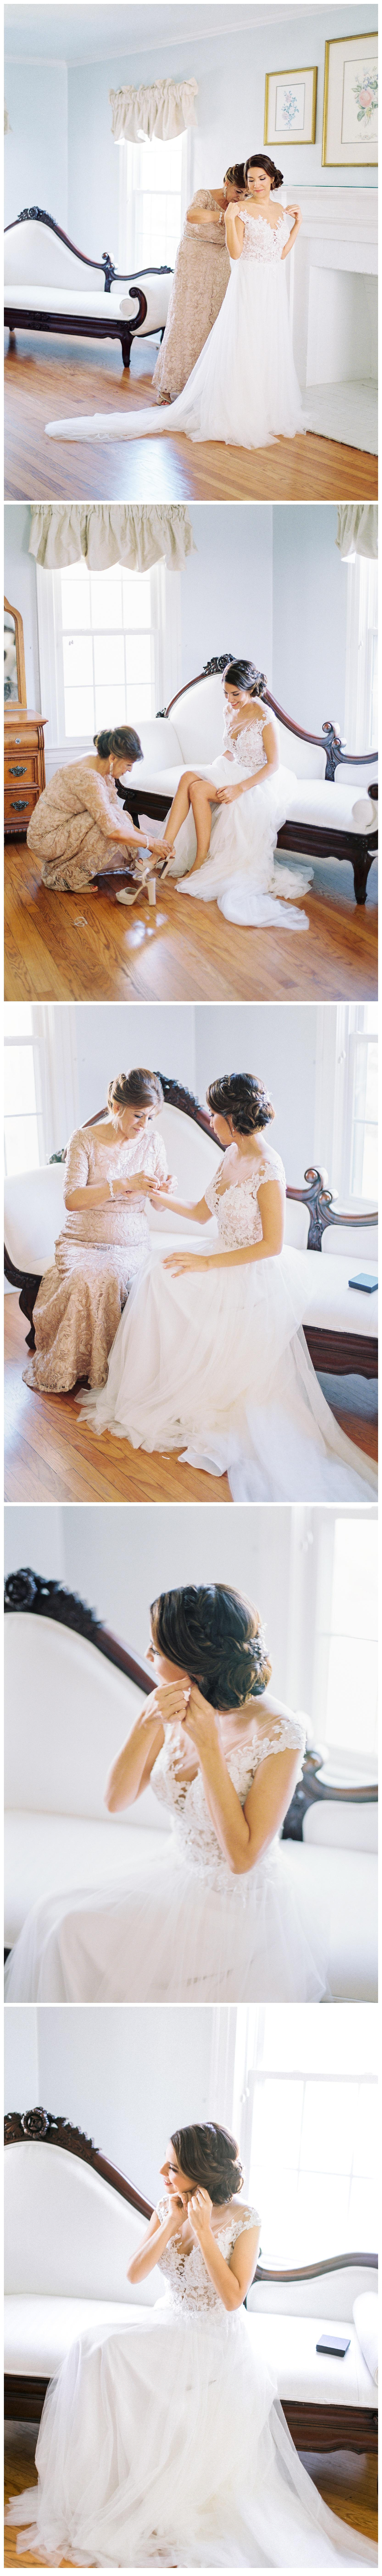 Cypress-Grove-Estate-House-Orlando-FL-Wedding-photos